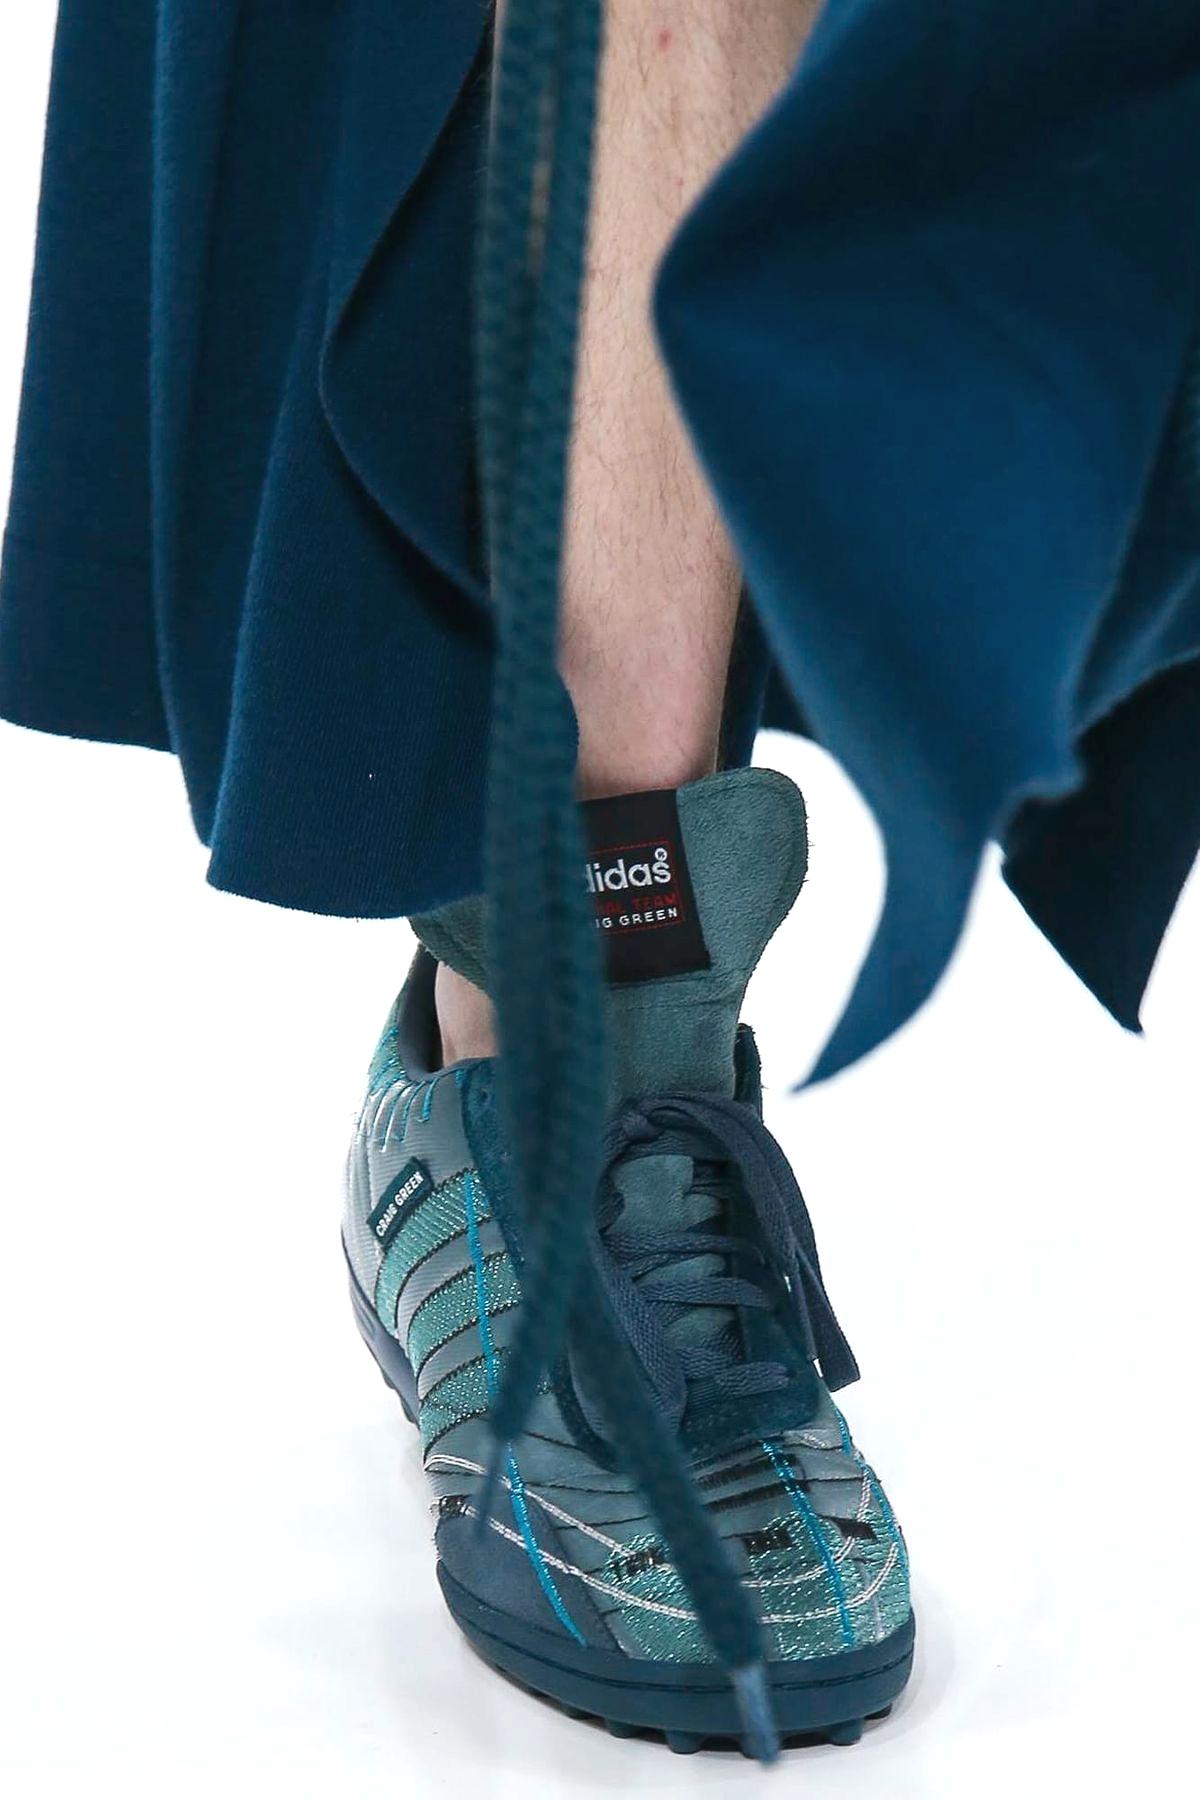 Craig Green Fall/Winter 2020 Menswear